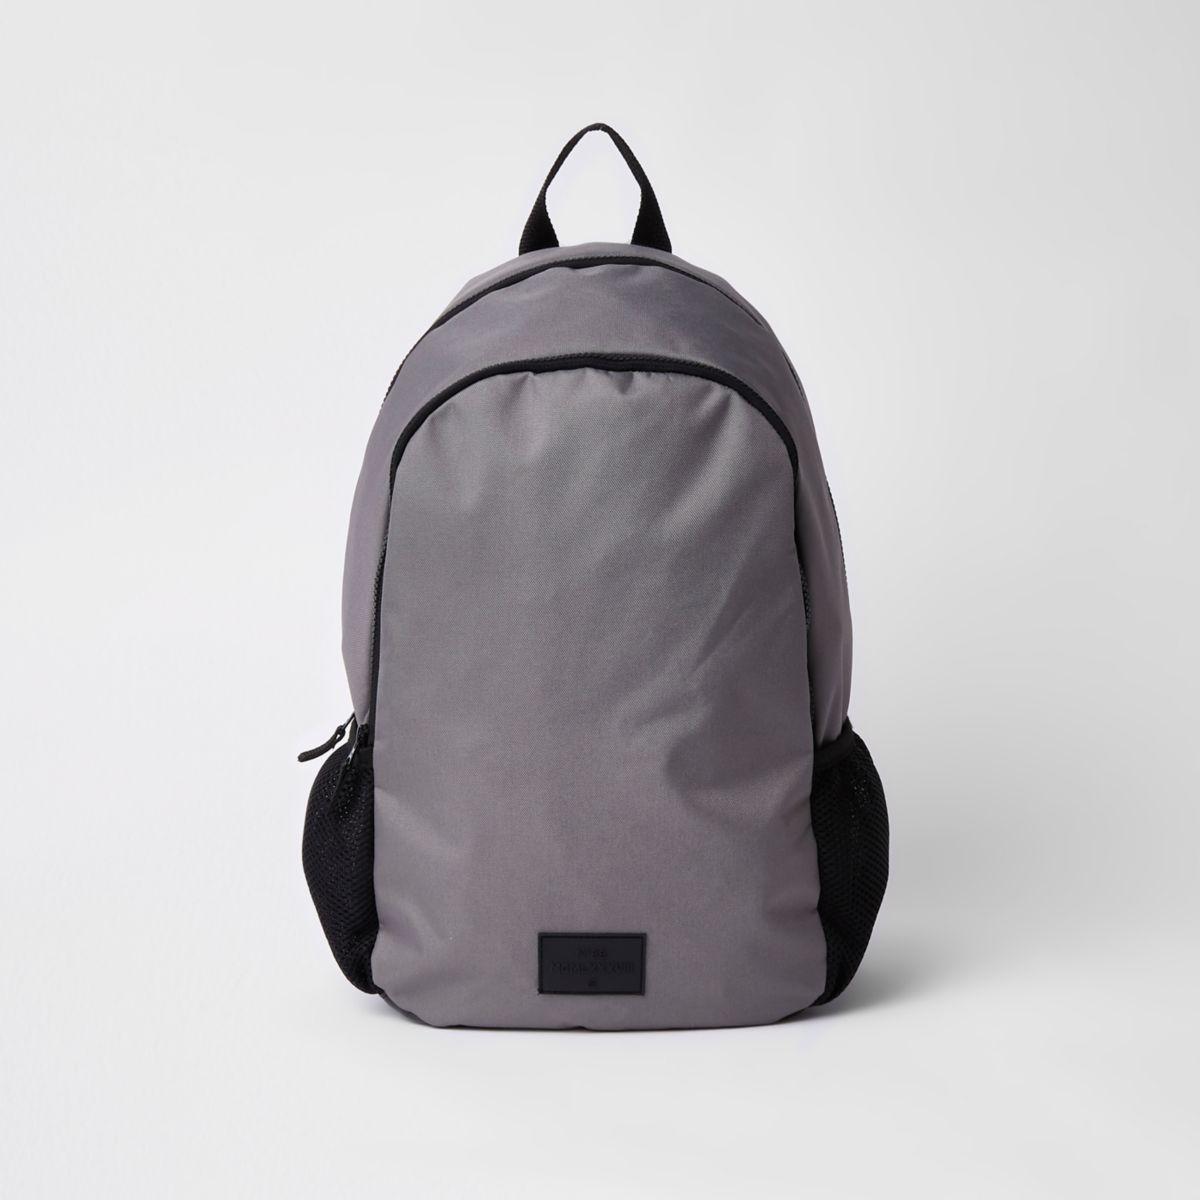 b44795a4ccc8 Grey double zip compartment rucksack - Backpacks   Rucksacks - Bags ...